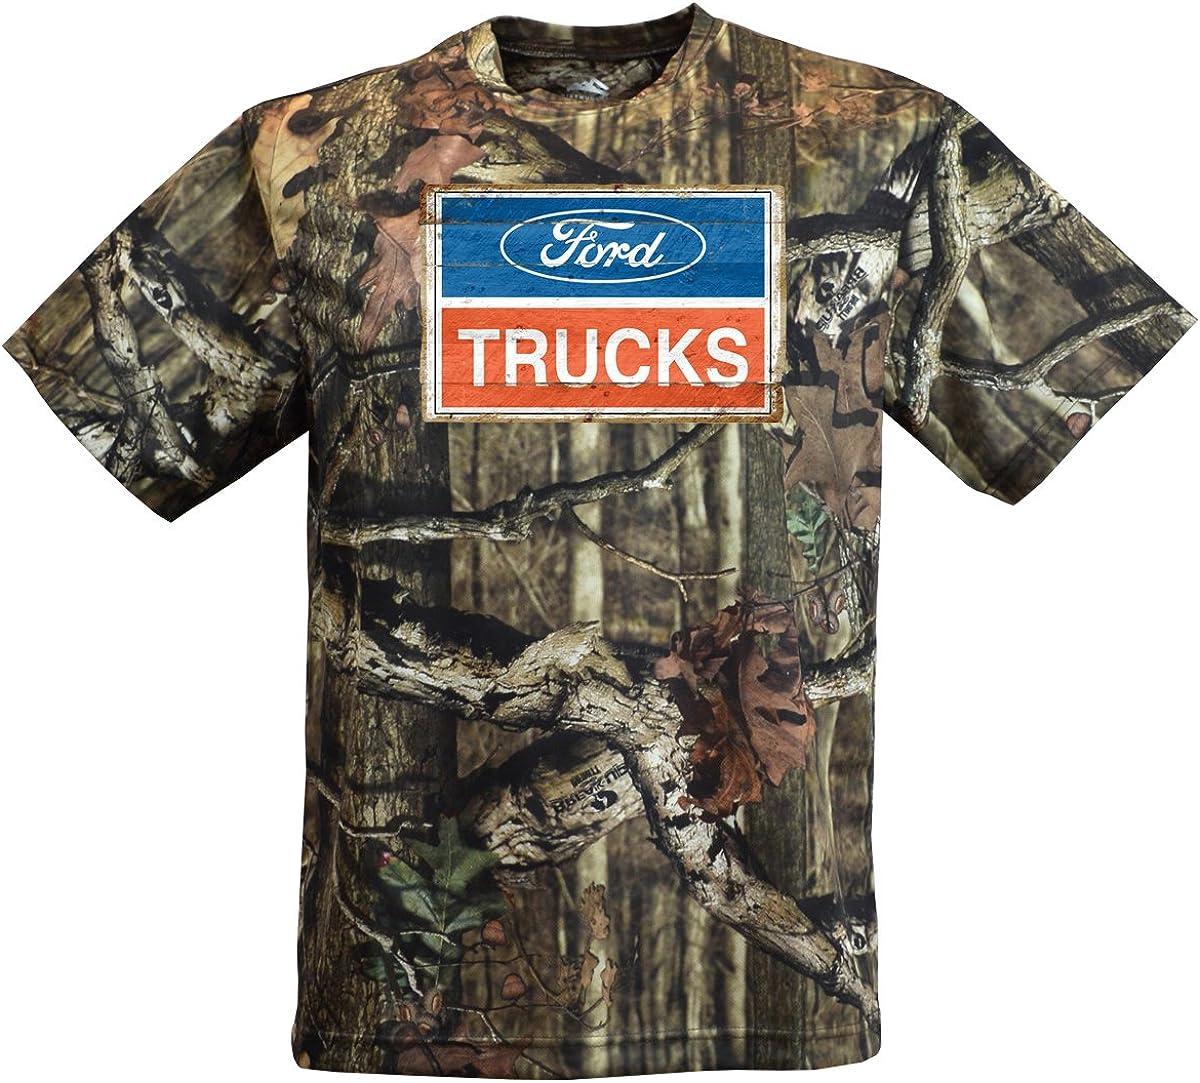 New Ford Truck Camo  Vintage Logo Tee Shirt